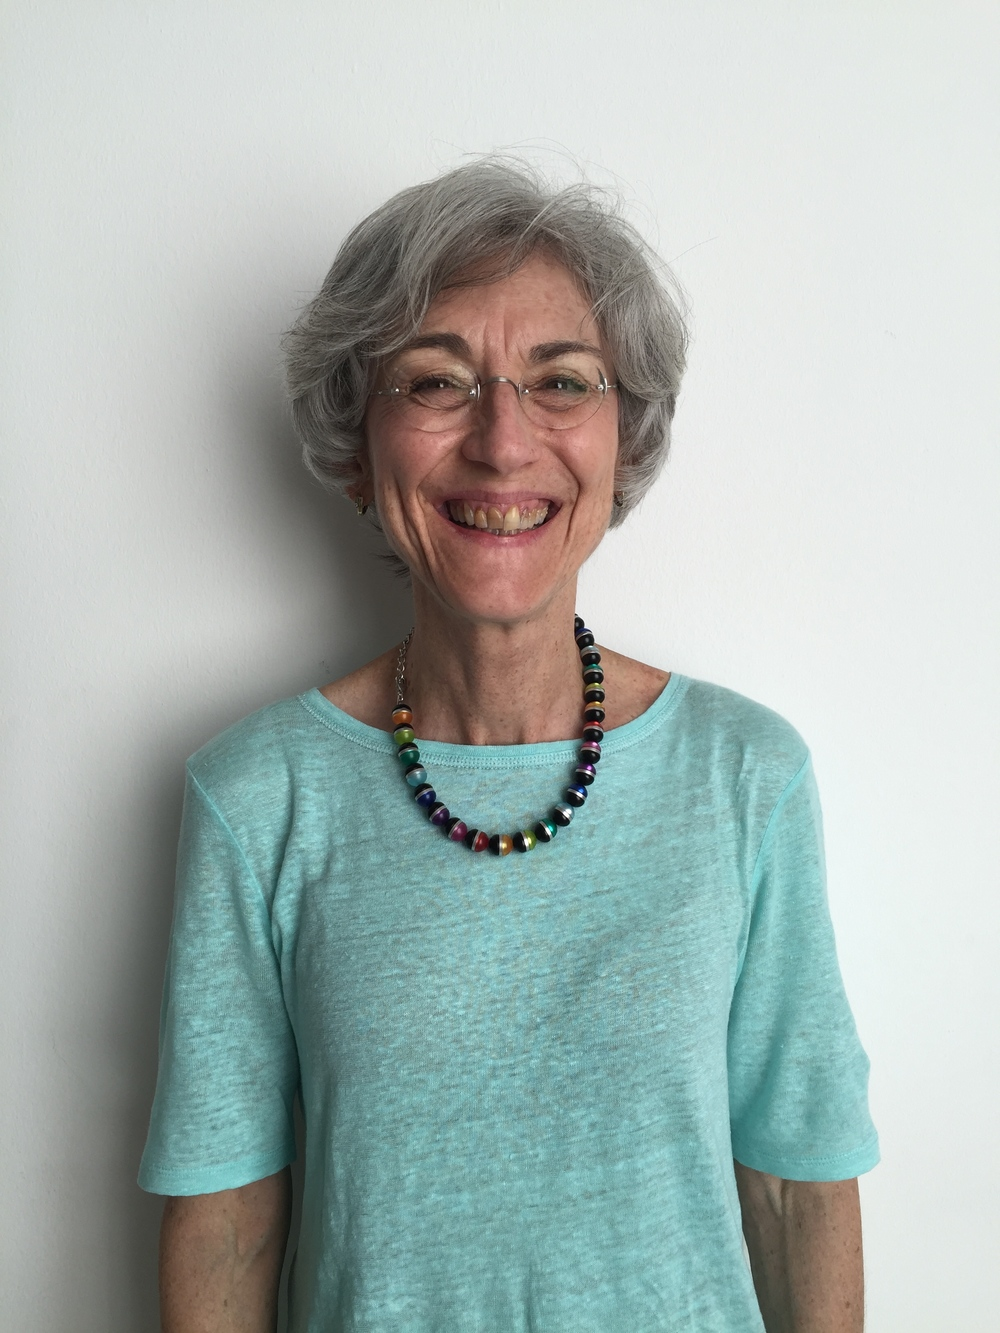 Vice president (Secretary General) Dr. Melanie Voigt